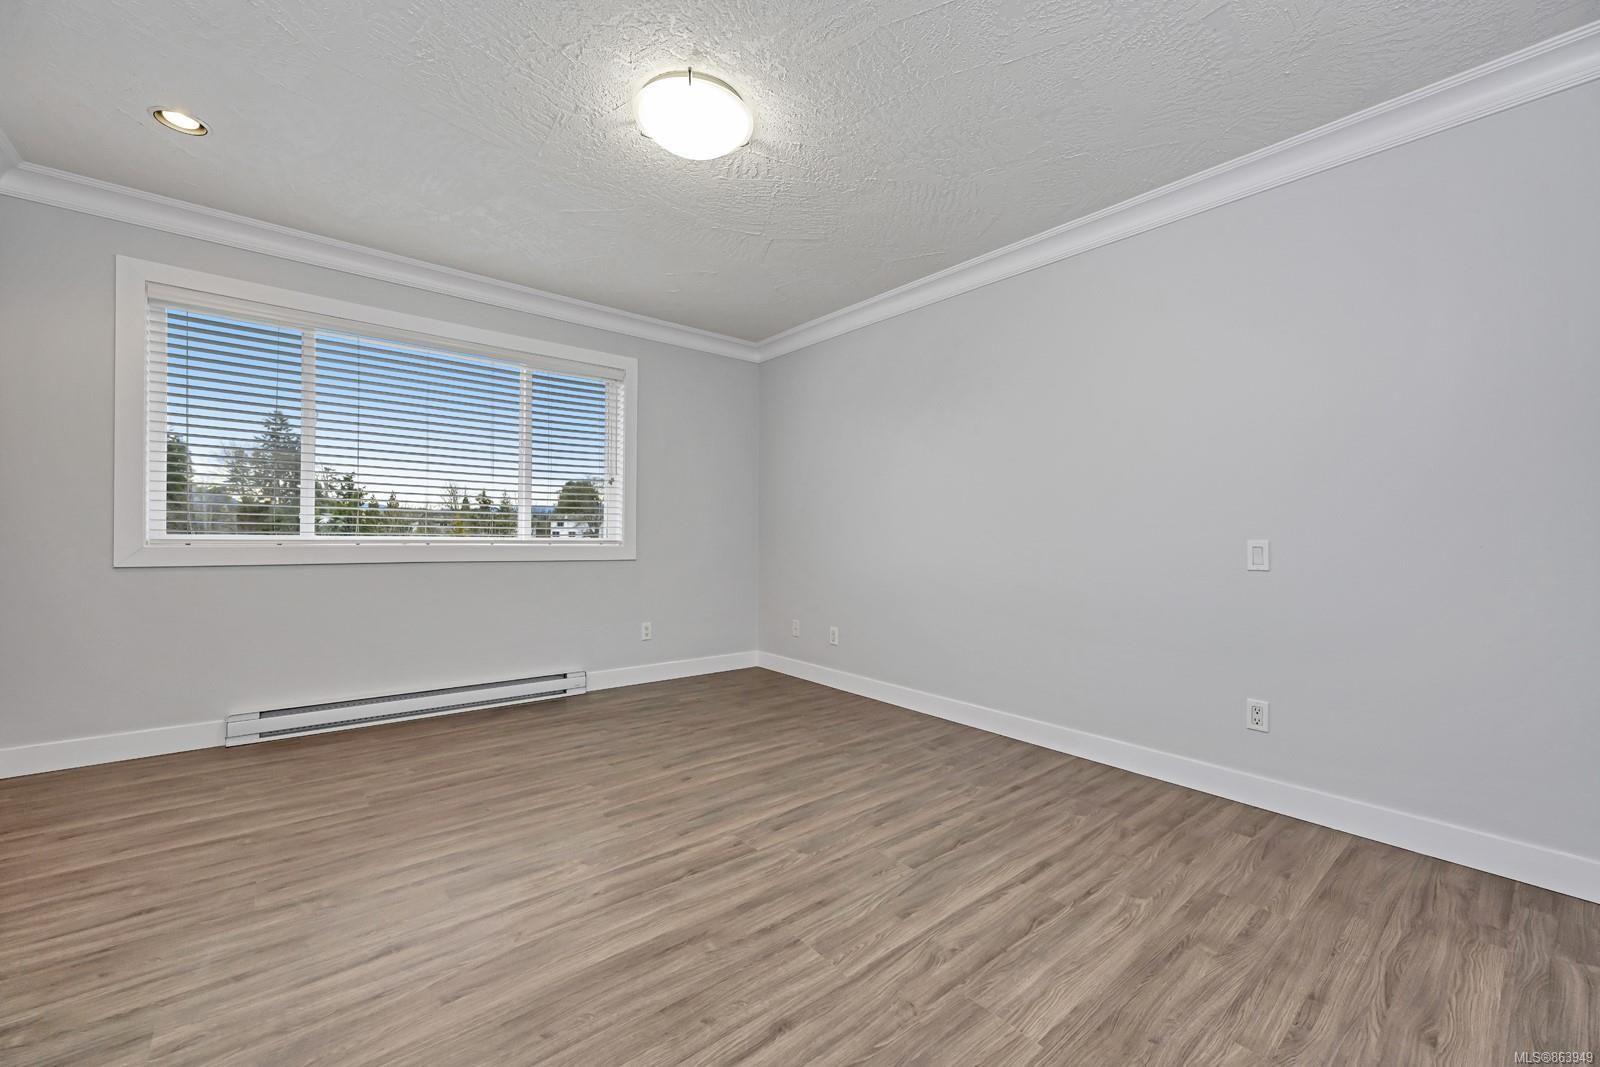 Photo 14: Photos: 6154 Sayward Rd in : Du West Duncan Half Duplex for sale (Duncan)  : MLS®# 863949